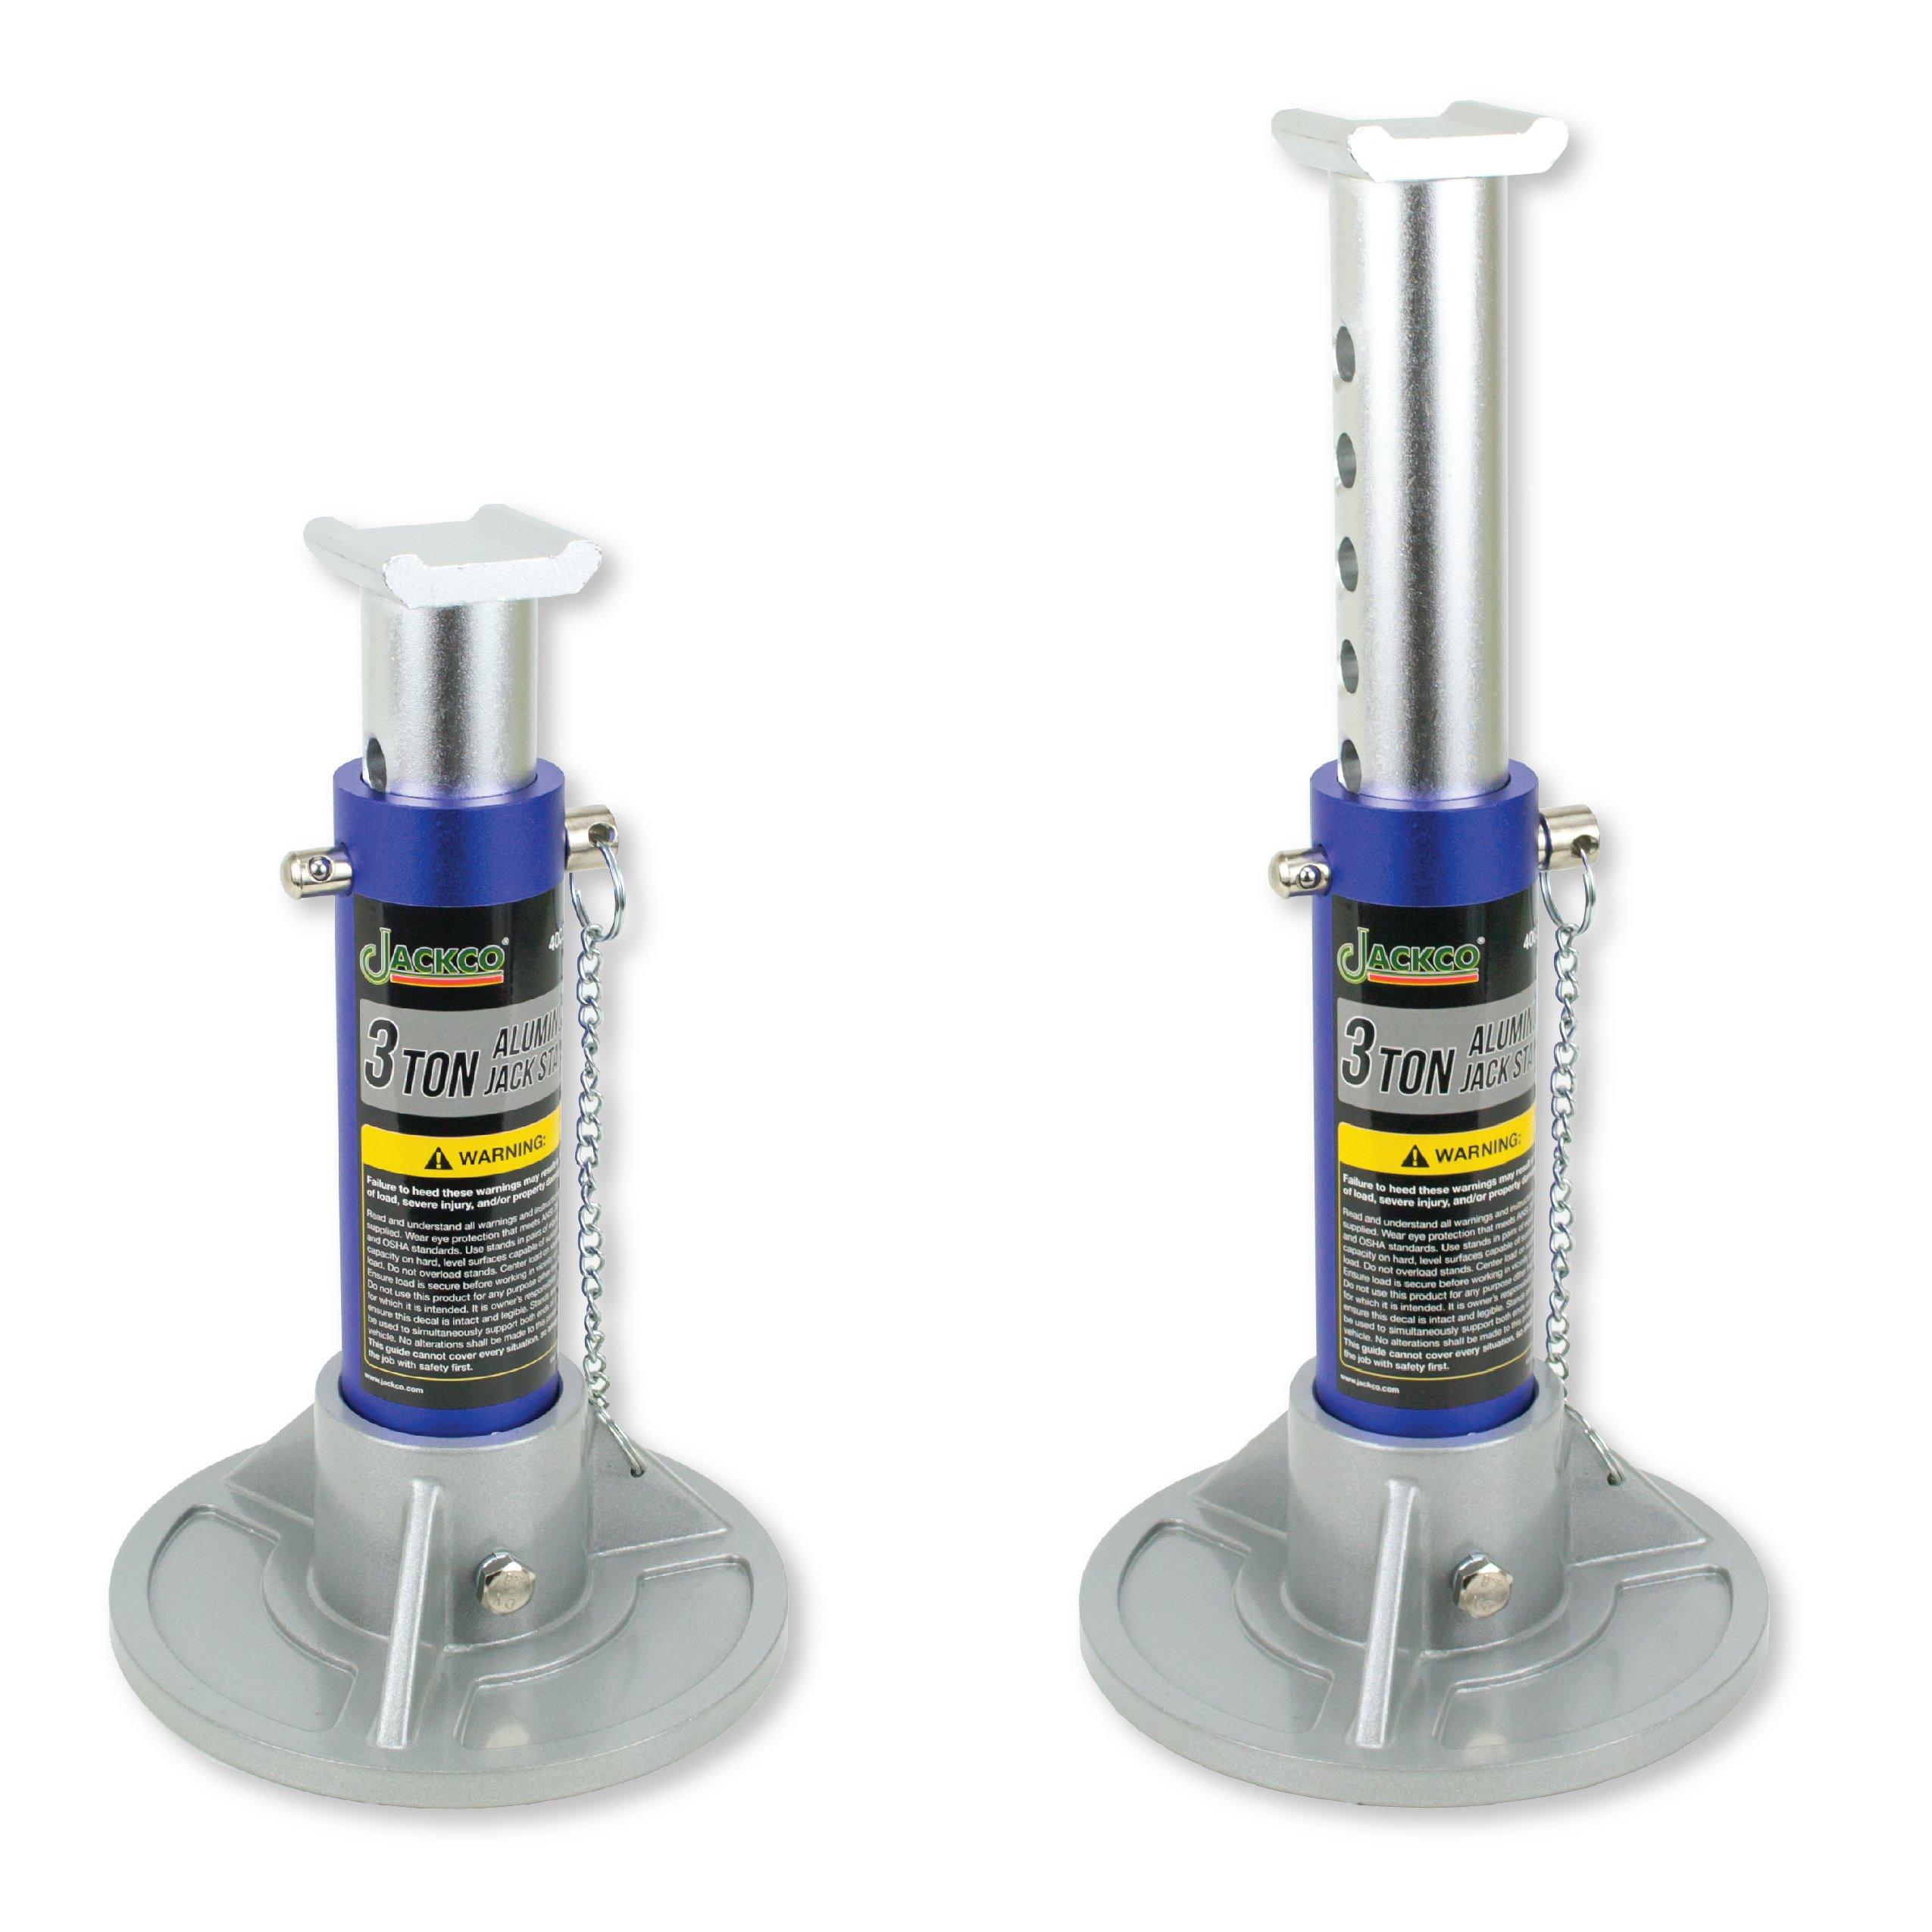 Jackco 3 Ton Capacity Aluminum Jack Stands (1 Pair) by Jackco